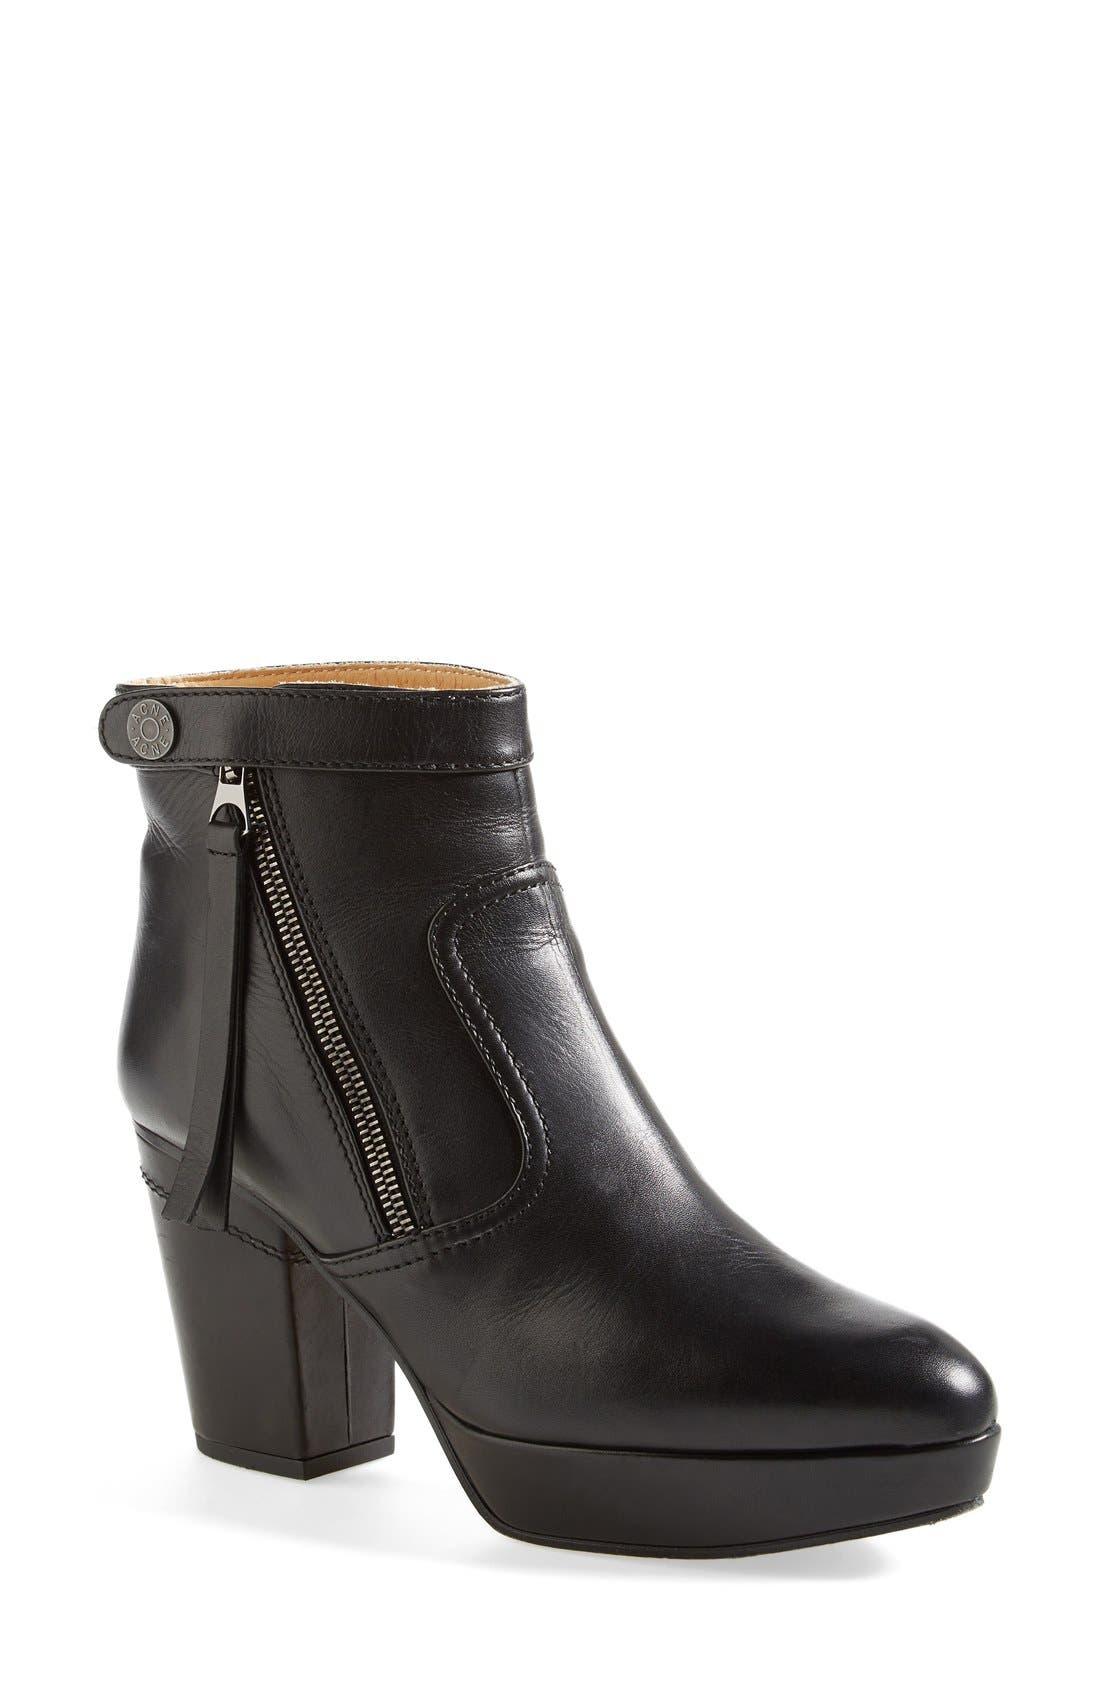 Main Image - Acne Studios 'Track' Platform Ankle Boot (Women)